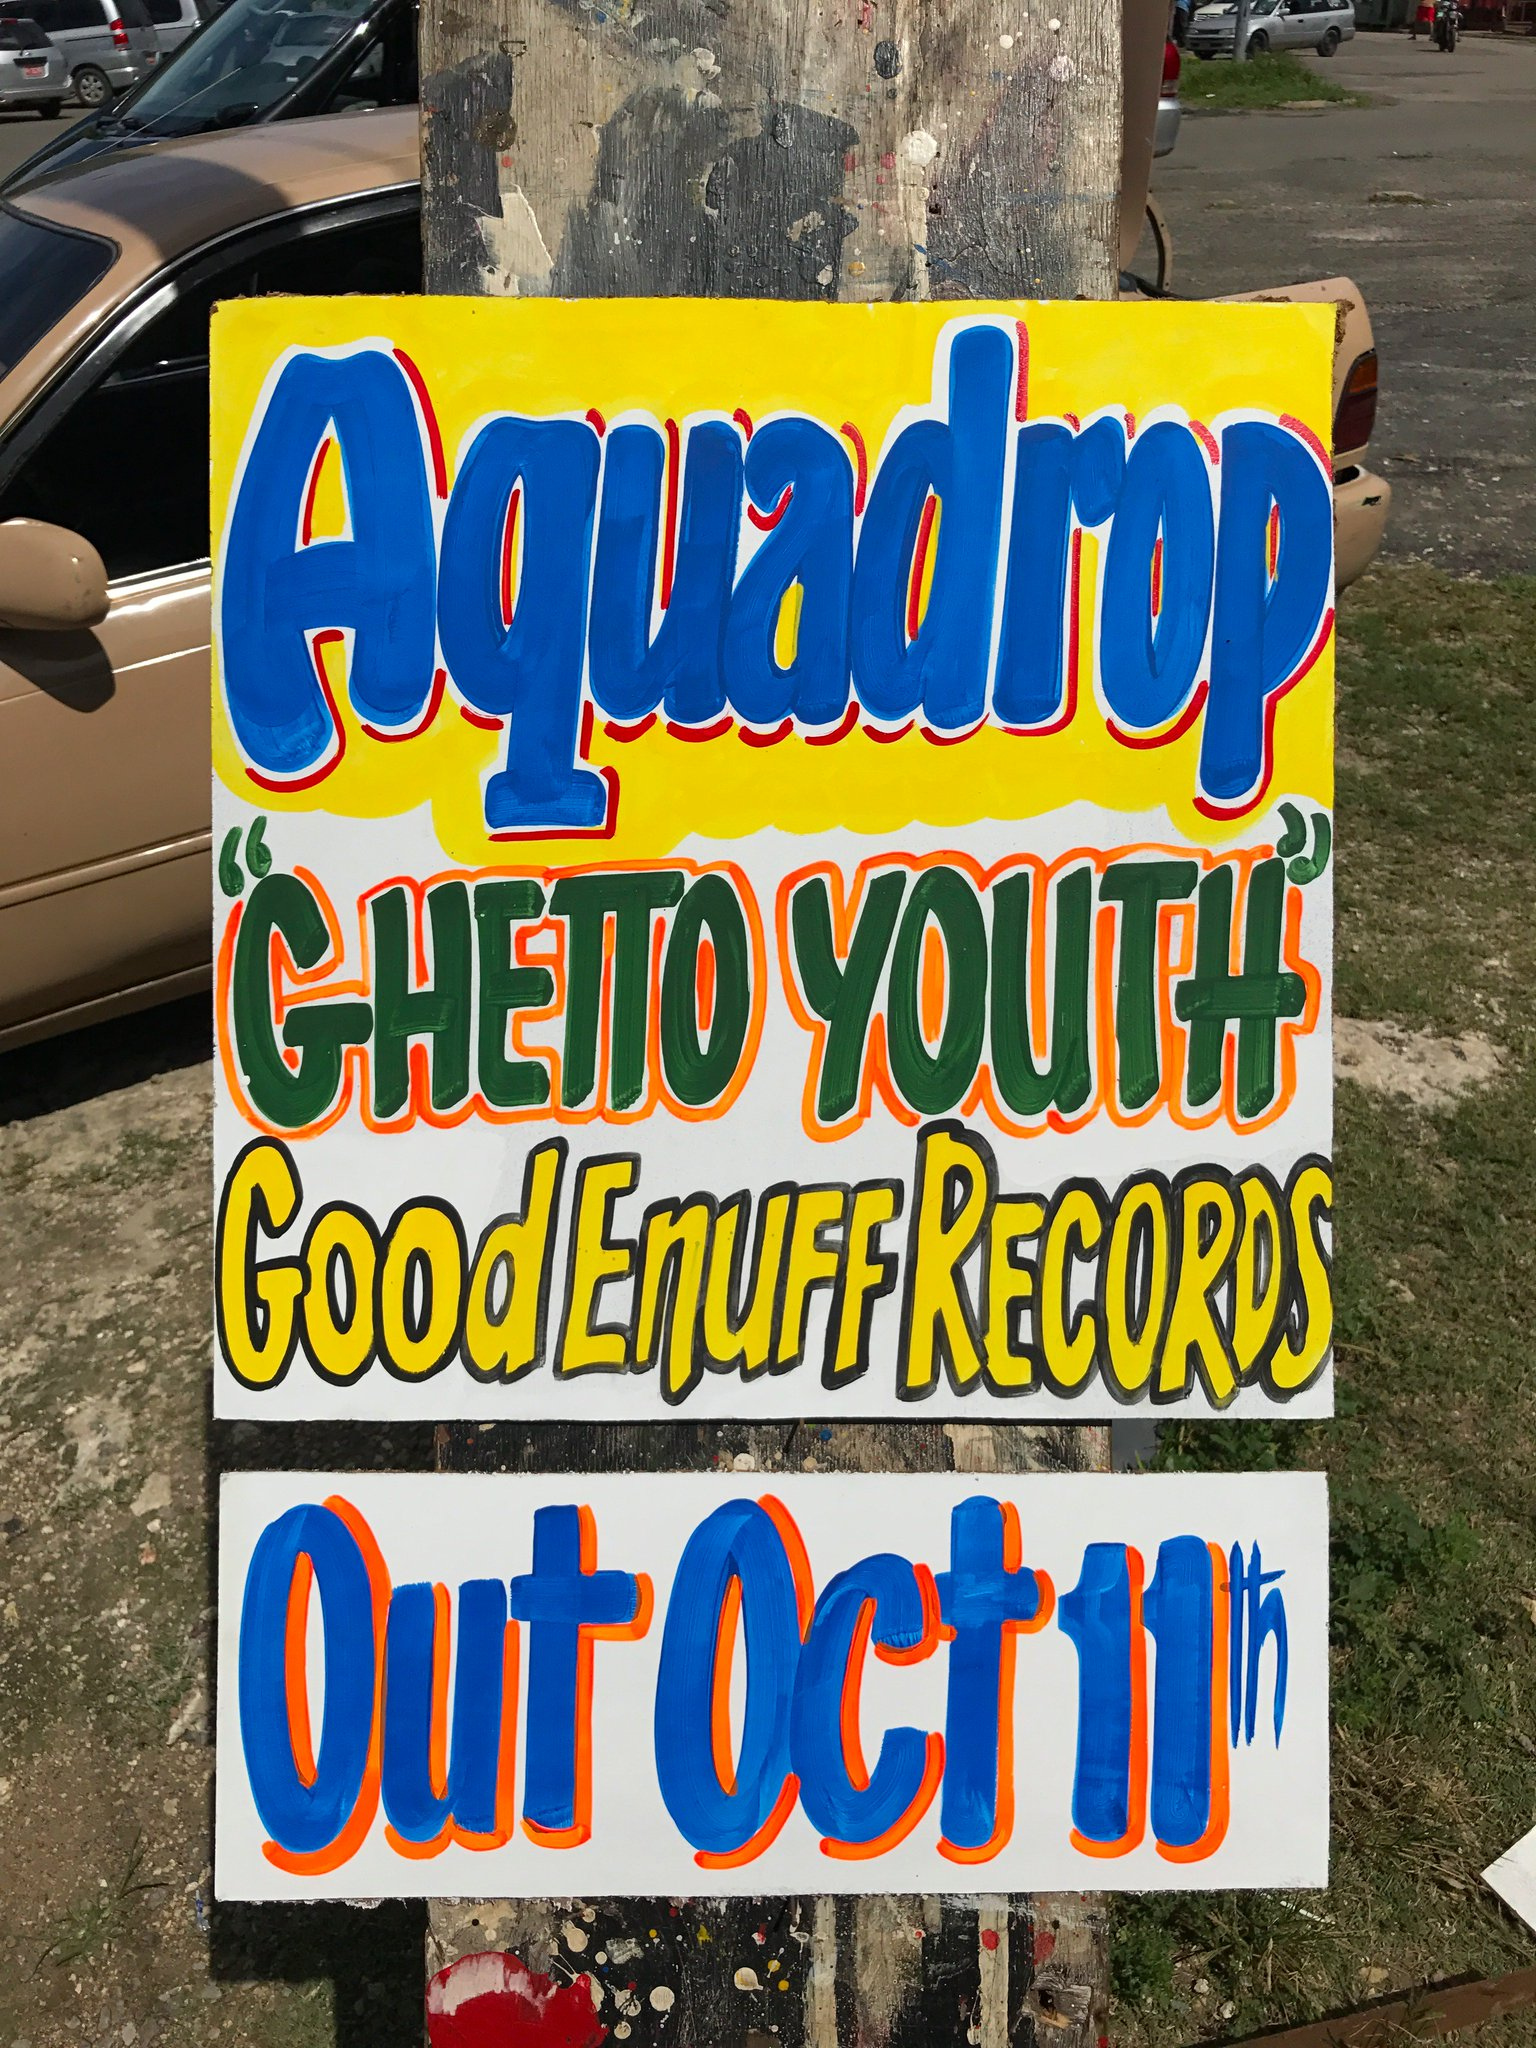 dropping new @1aquadrop1 on @GoodEnuff tomorrow �� https://t.co/J4RNYDNcOu